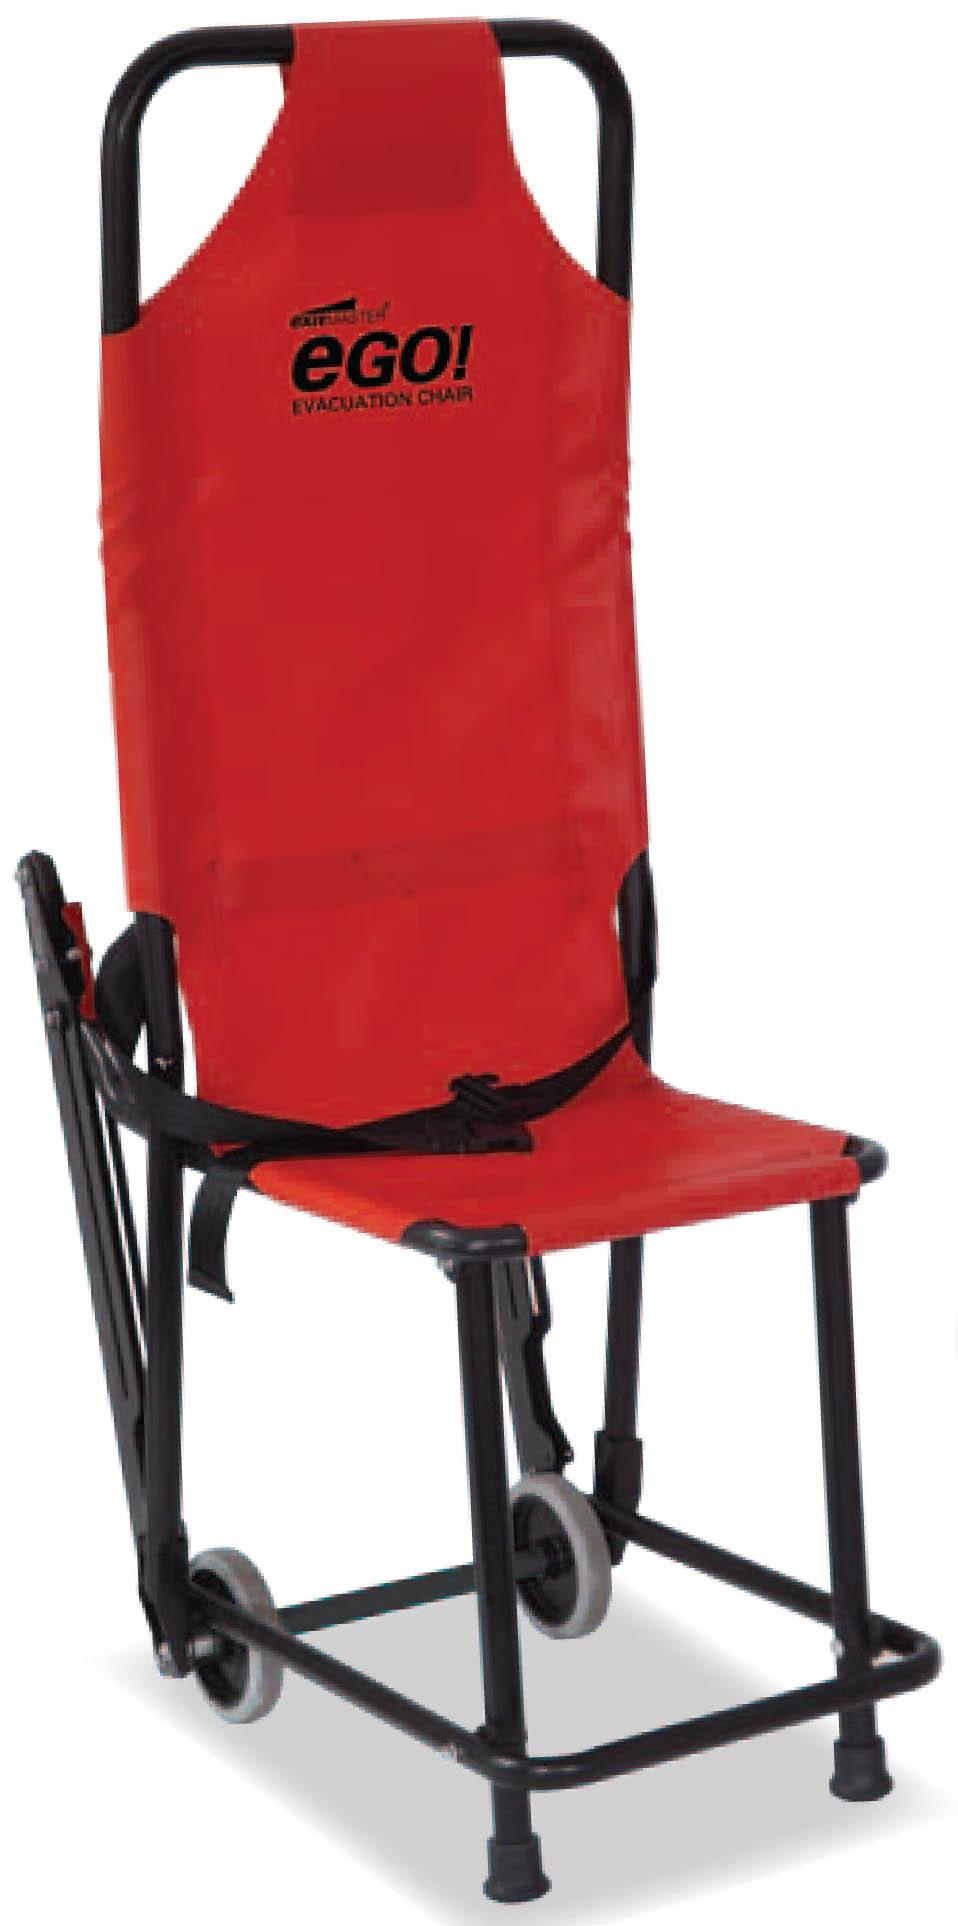 Ego Evacuation Chairs